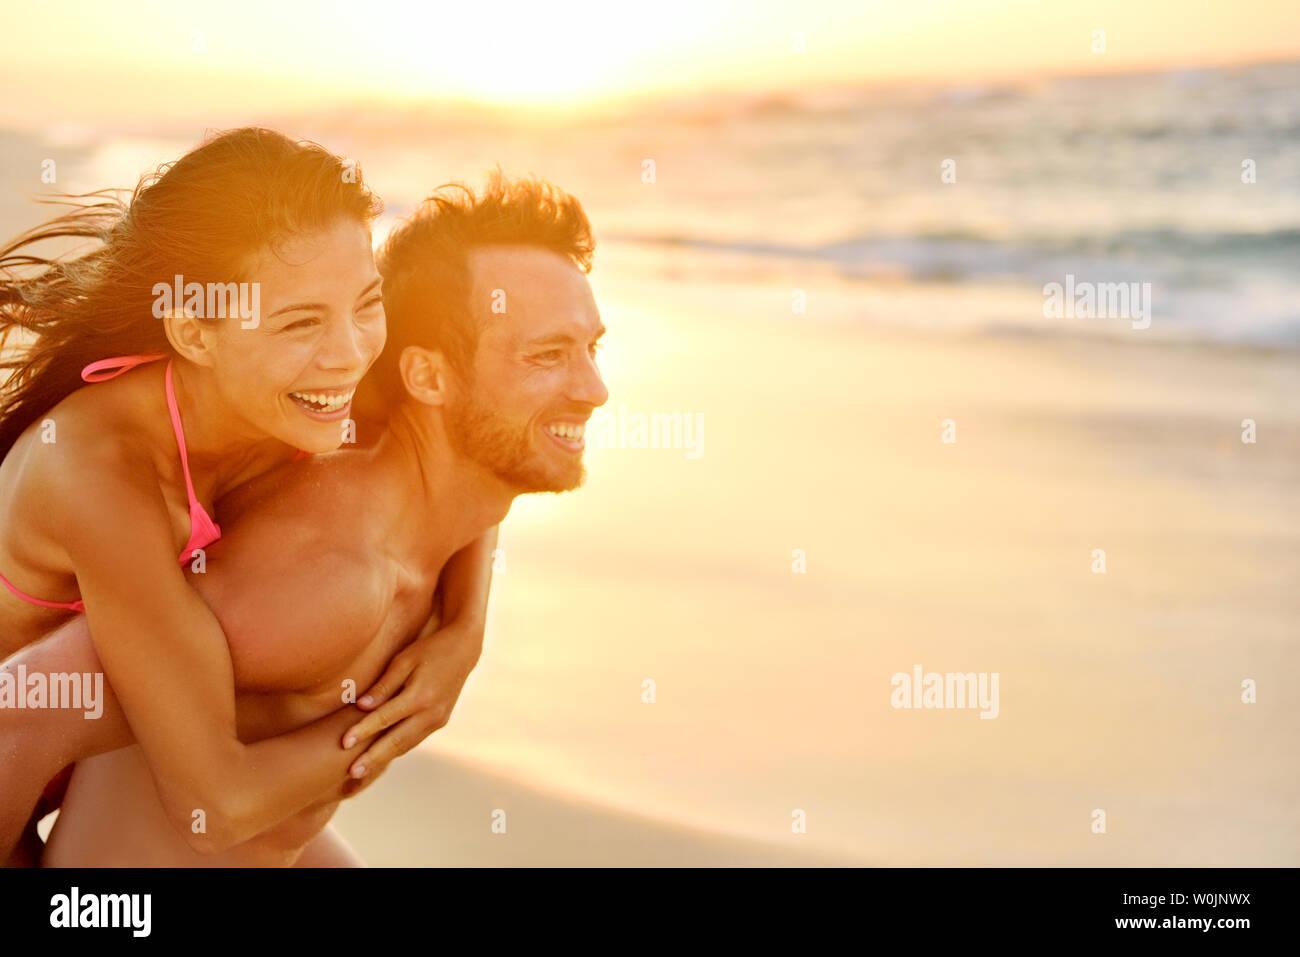 dating på Hawaii Gratis Dating Sites Niagara